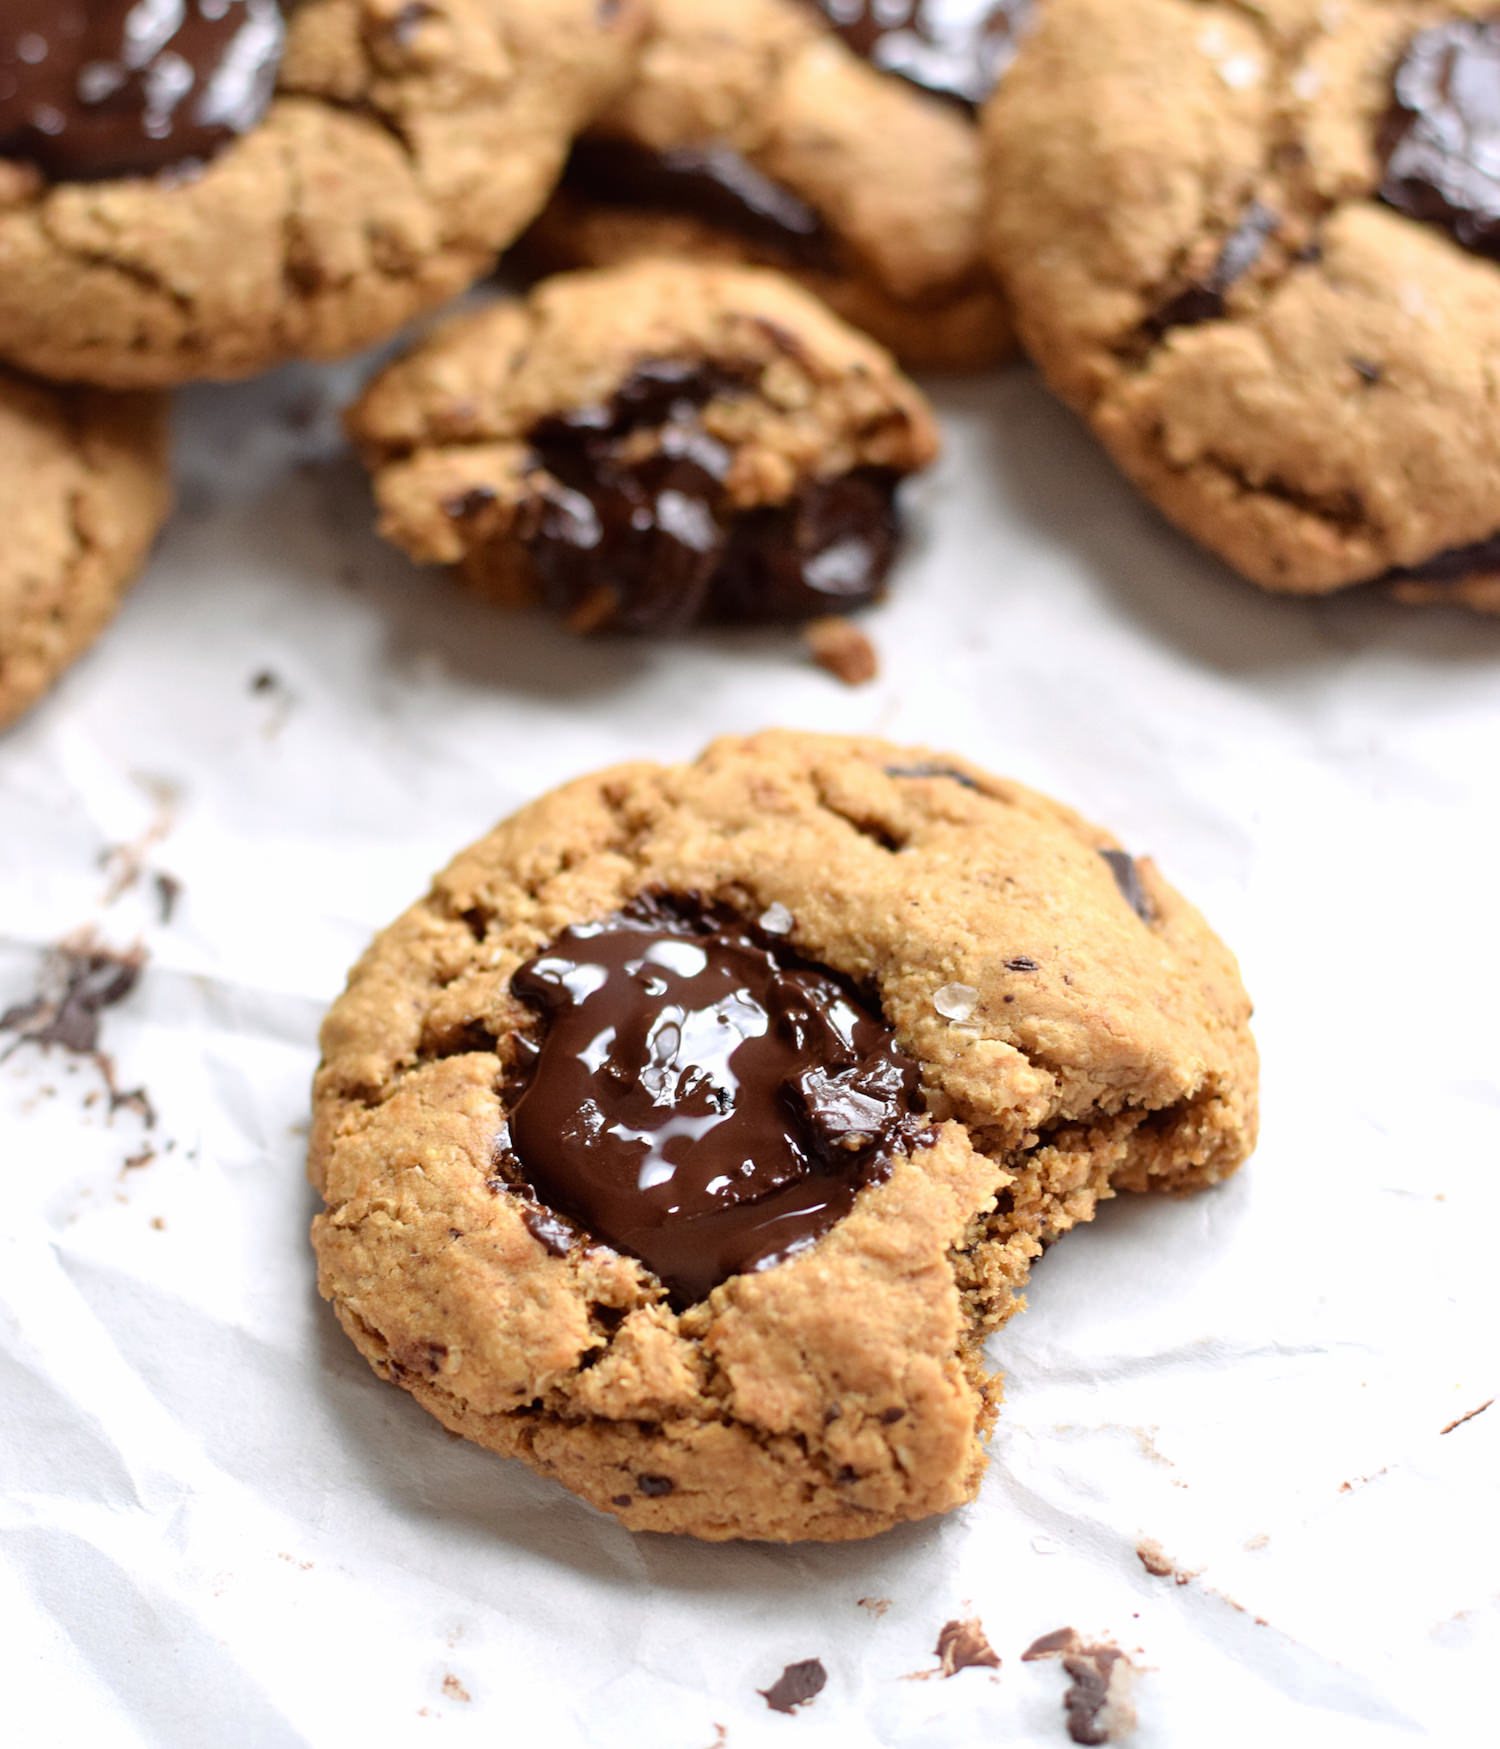 Salt and Pepper Cookies